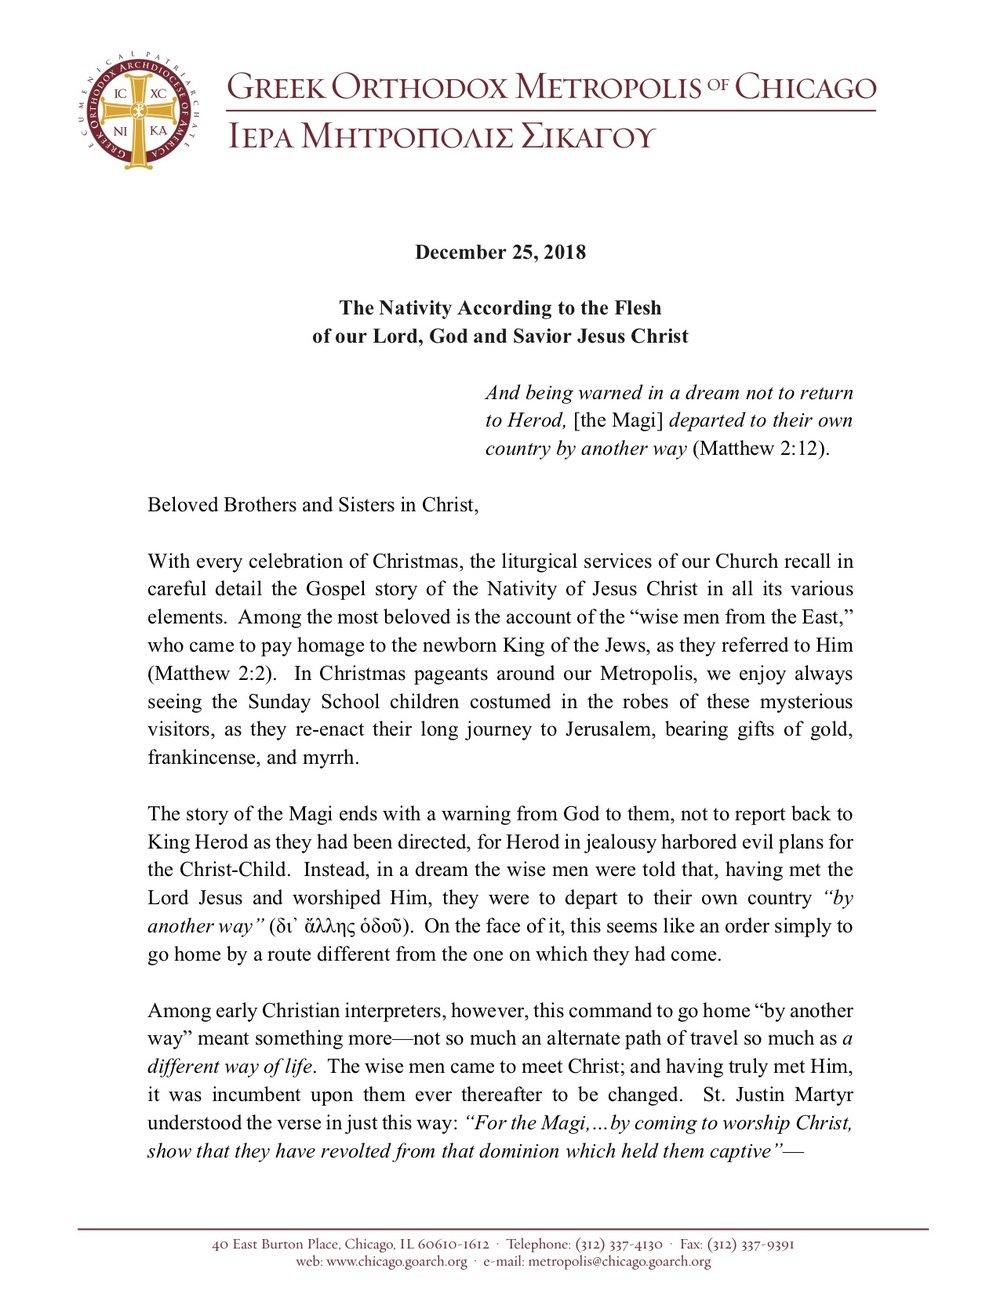 2018 Nativity Encyclical in English